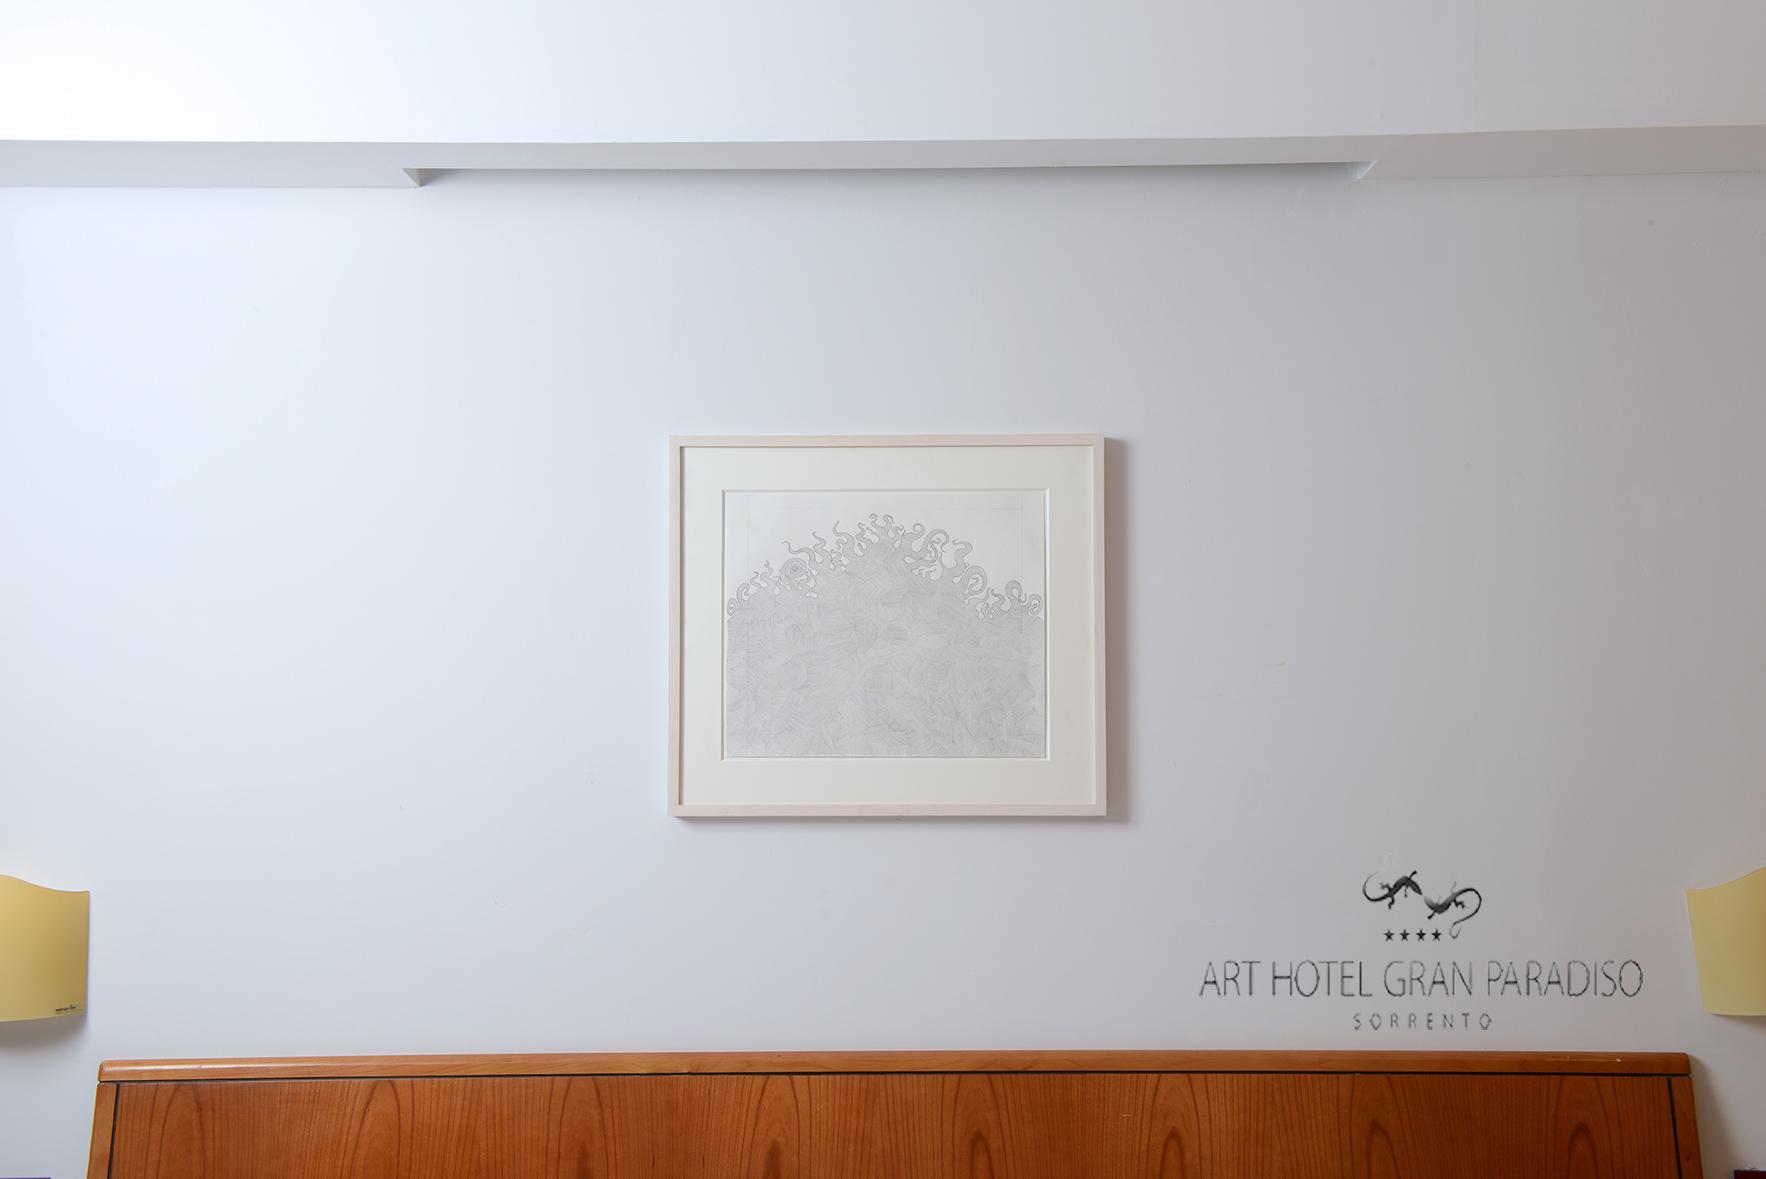 Art_Hotel_Gran_Paradiso_2013_319_Jacob_Hashimoto_1.jpg